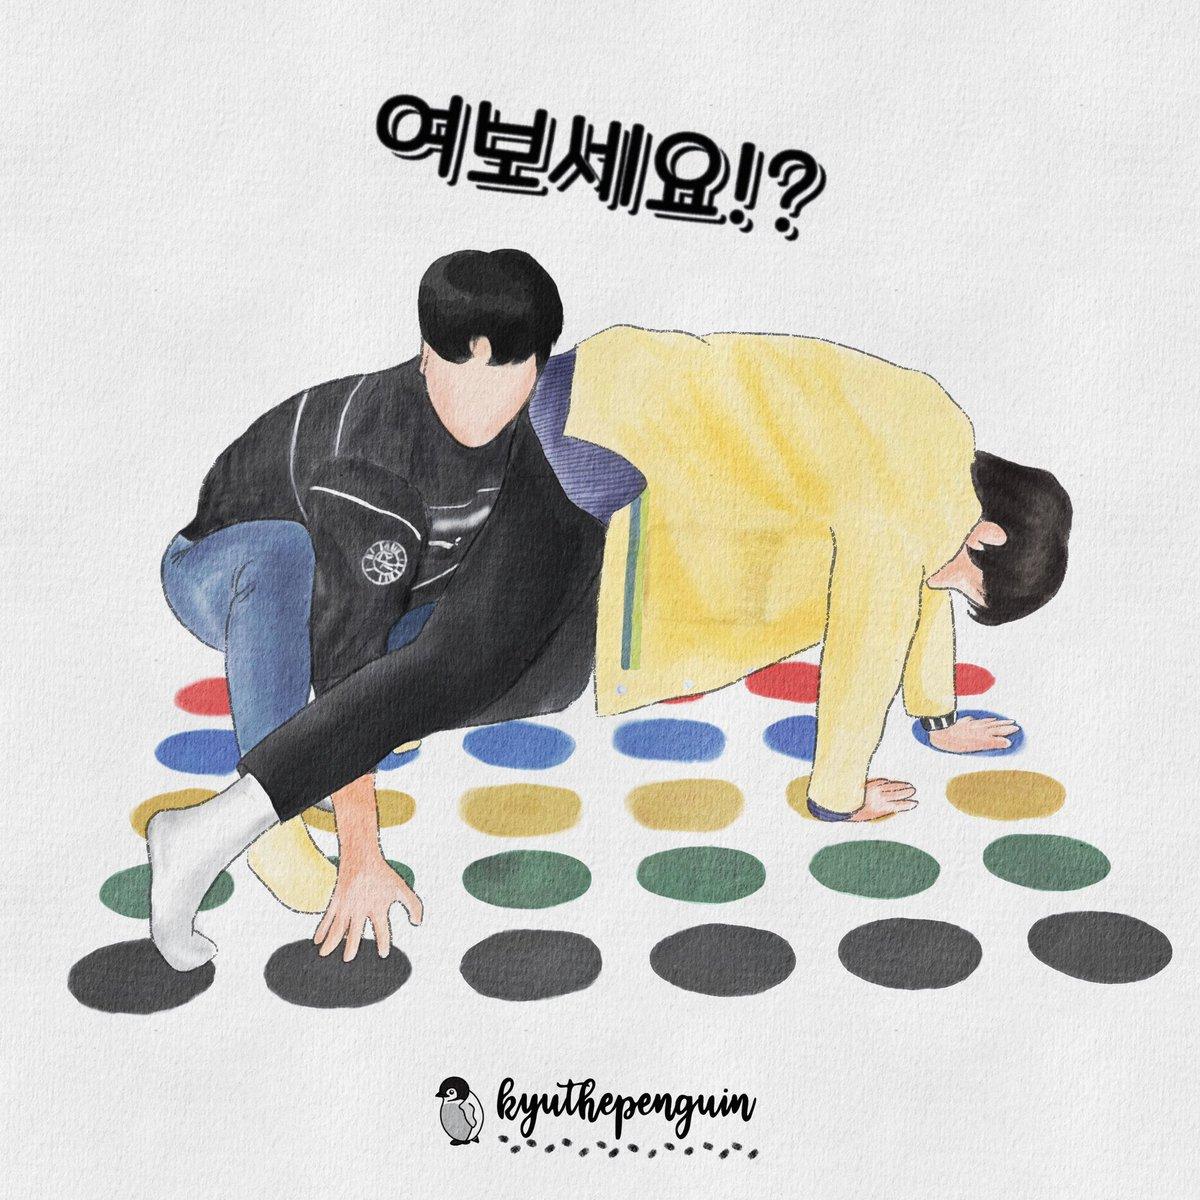 20200709  SJ Returns 4 - 여보세요?☎️  #SJReturns4 #규현 #KyuHyun #신동 #ShinDong #神童 #슈퍼주니어 #SuperJunior